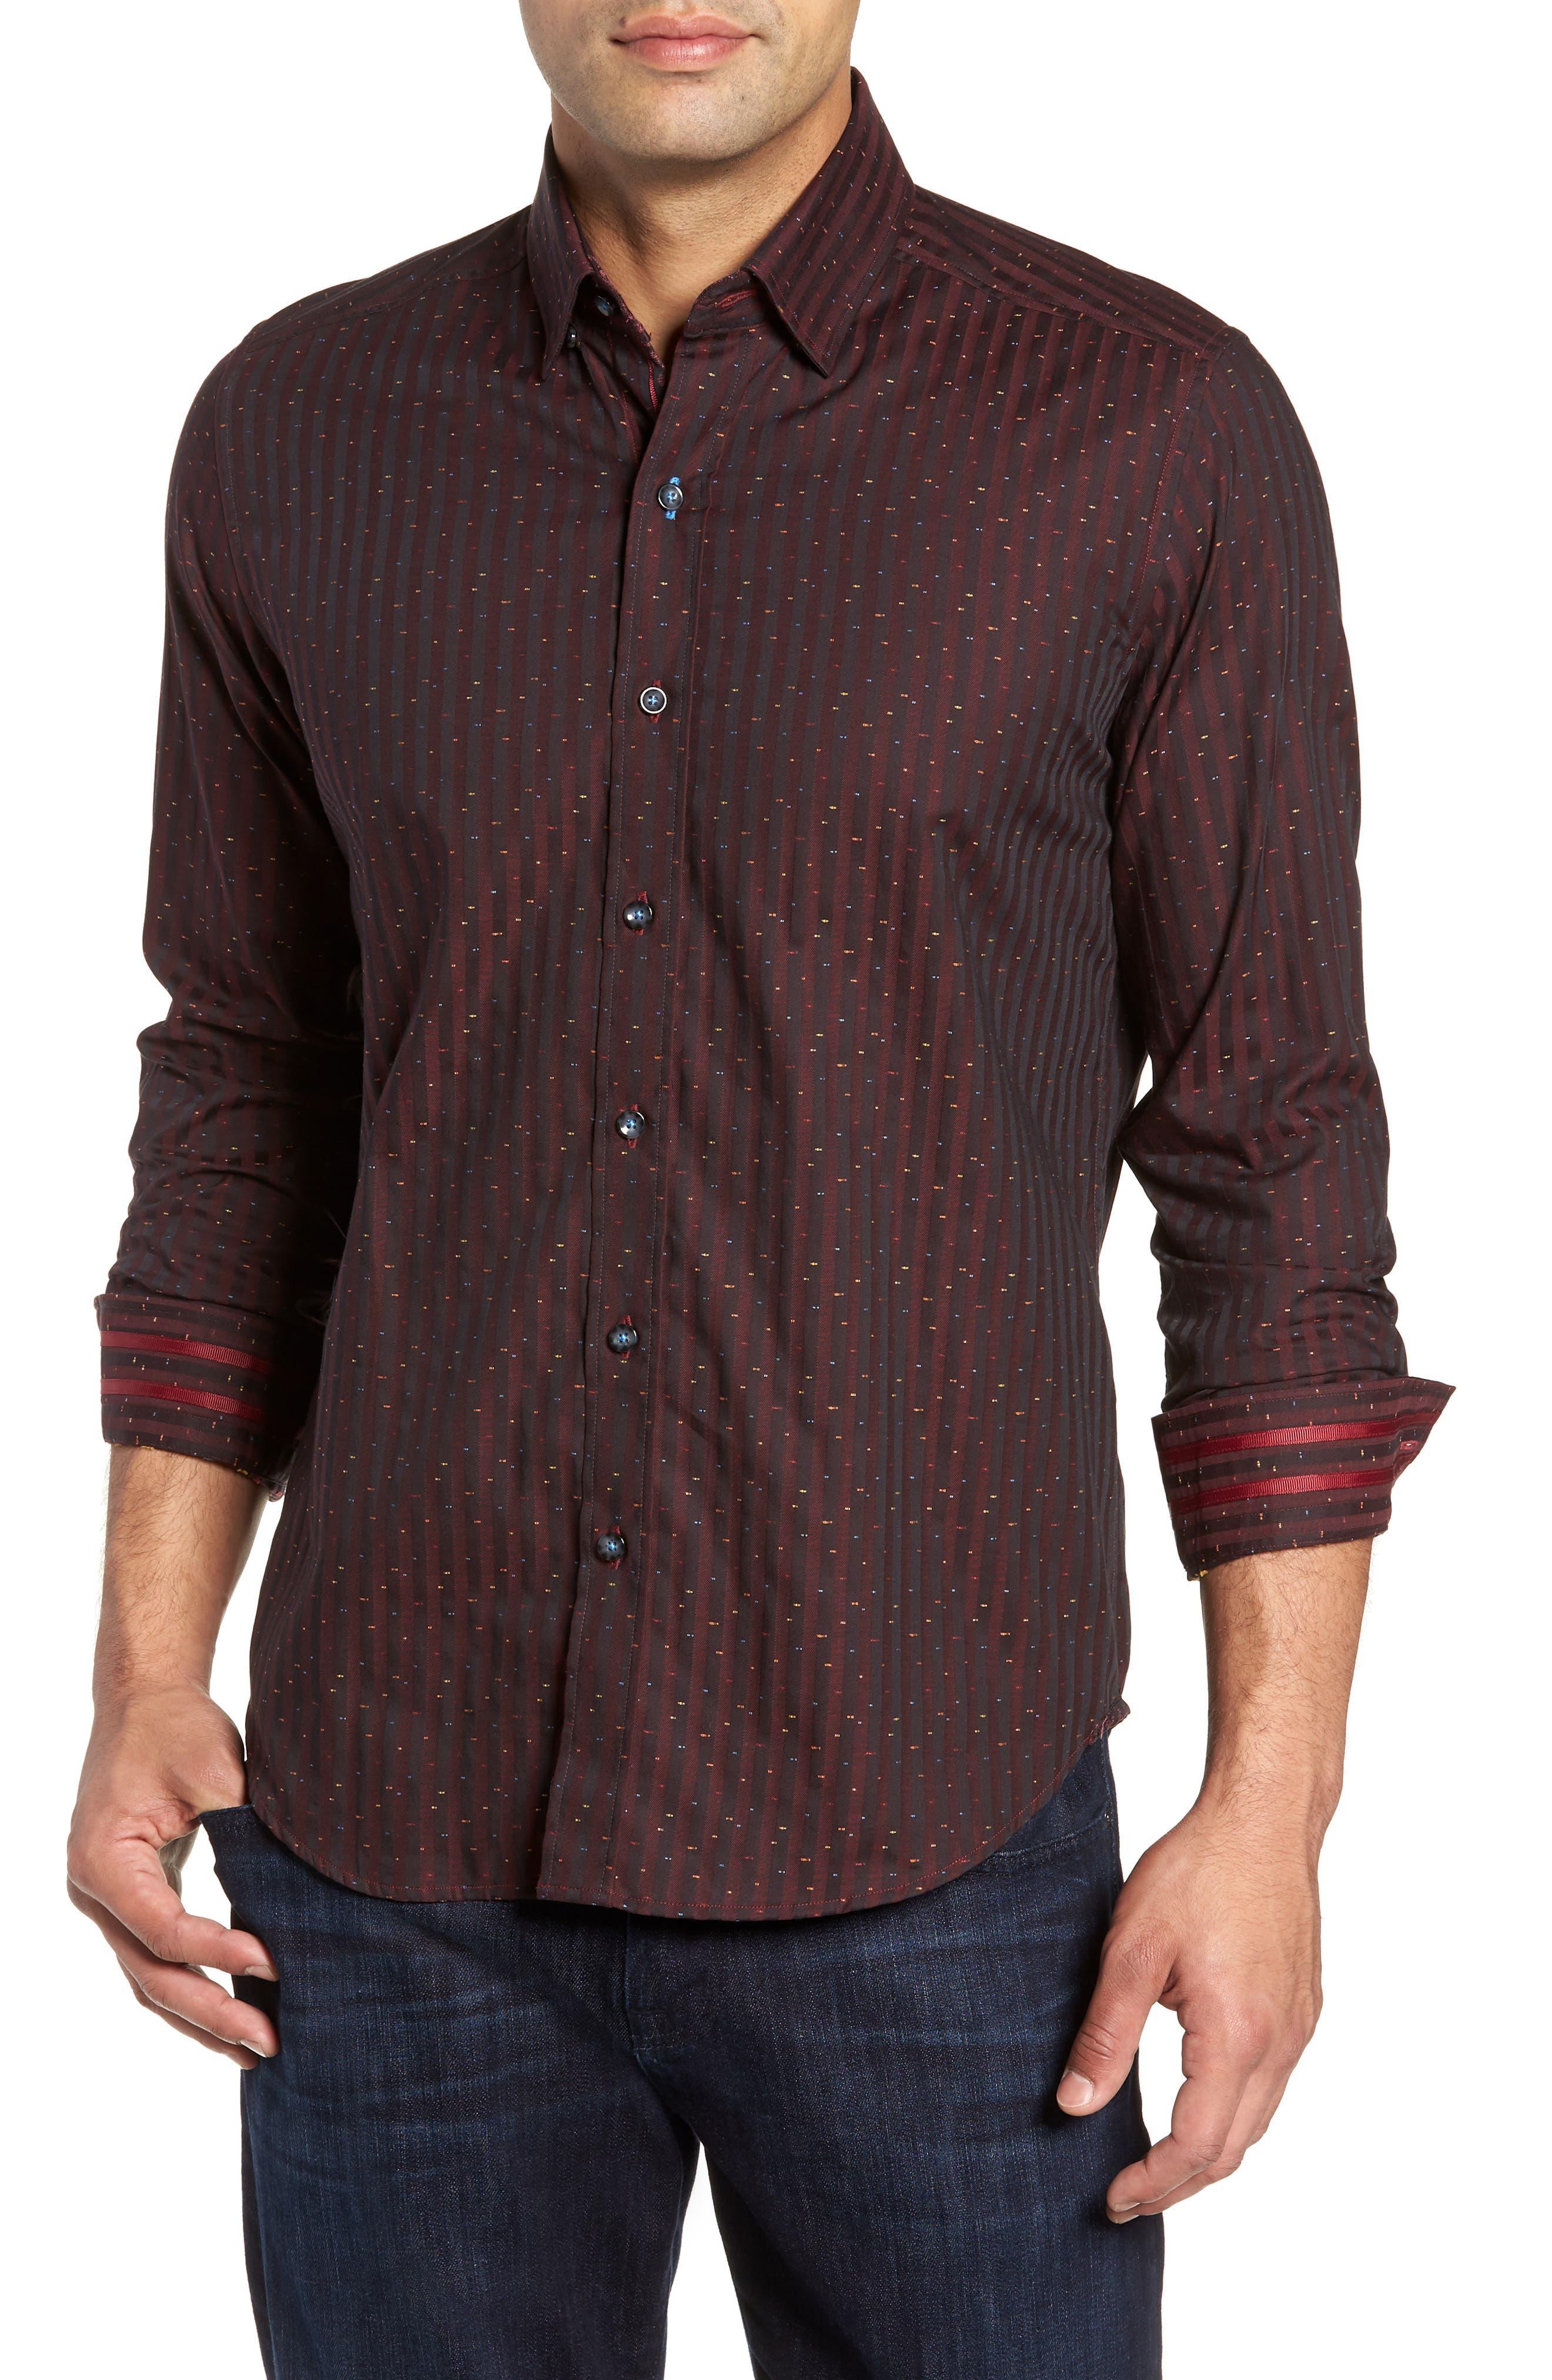 ROBERT GRAHAM,                             McDermott Tailored Fit Print Sport Shirt,                             Main thumbnail 1, color,                             603